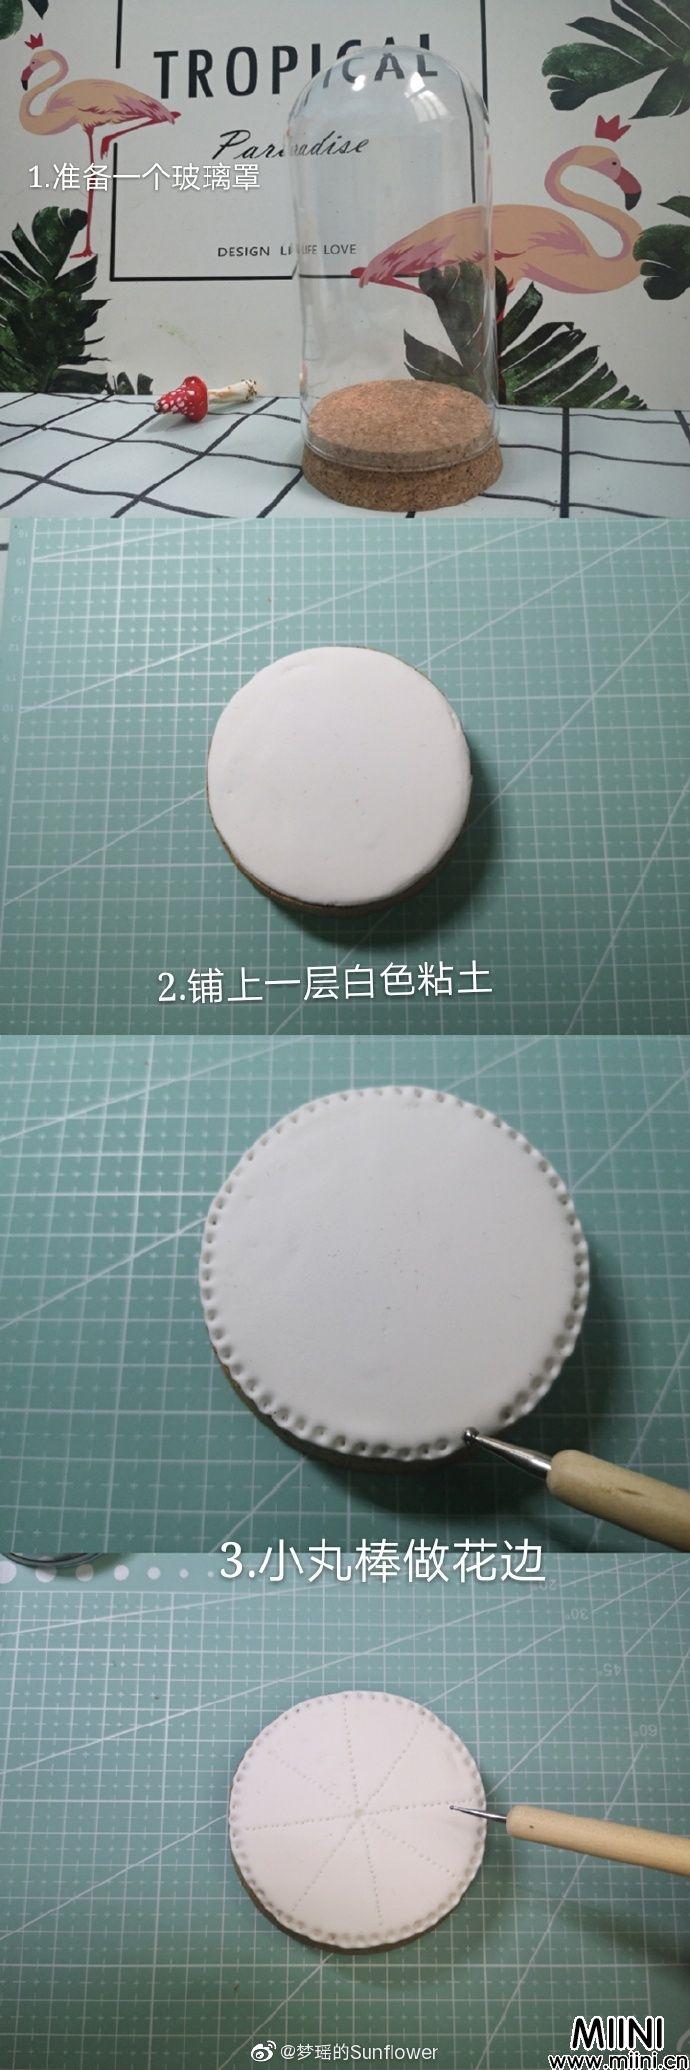 <a href=http://www.miini.cn/search-0-495.html target=_blank class=infotextkey>粘土</a>生日蛋糕制作教程